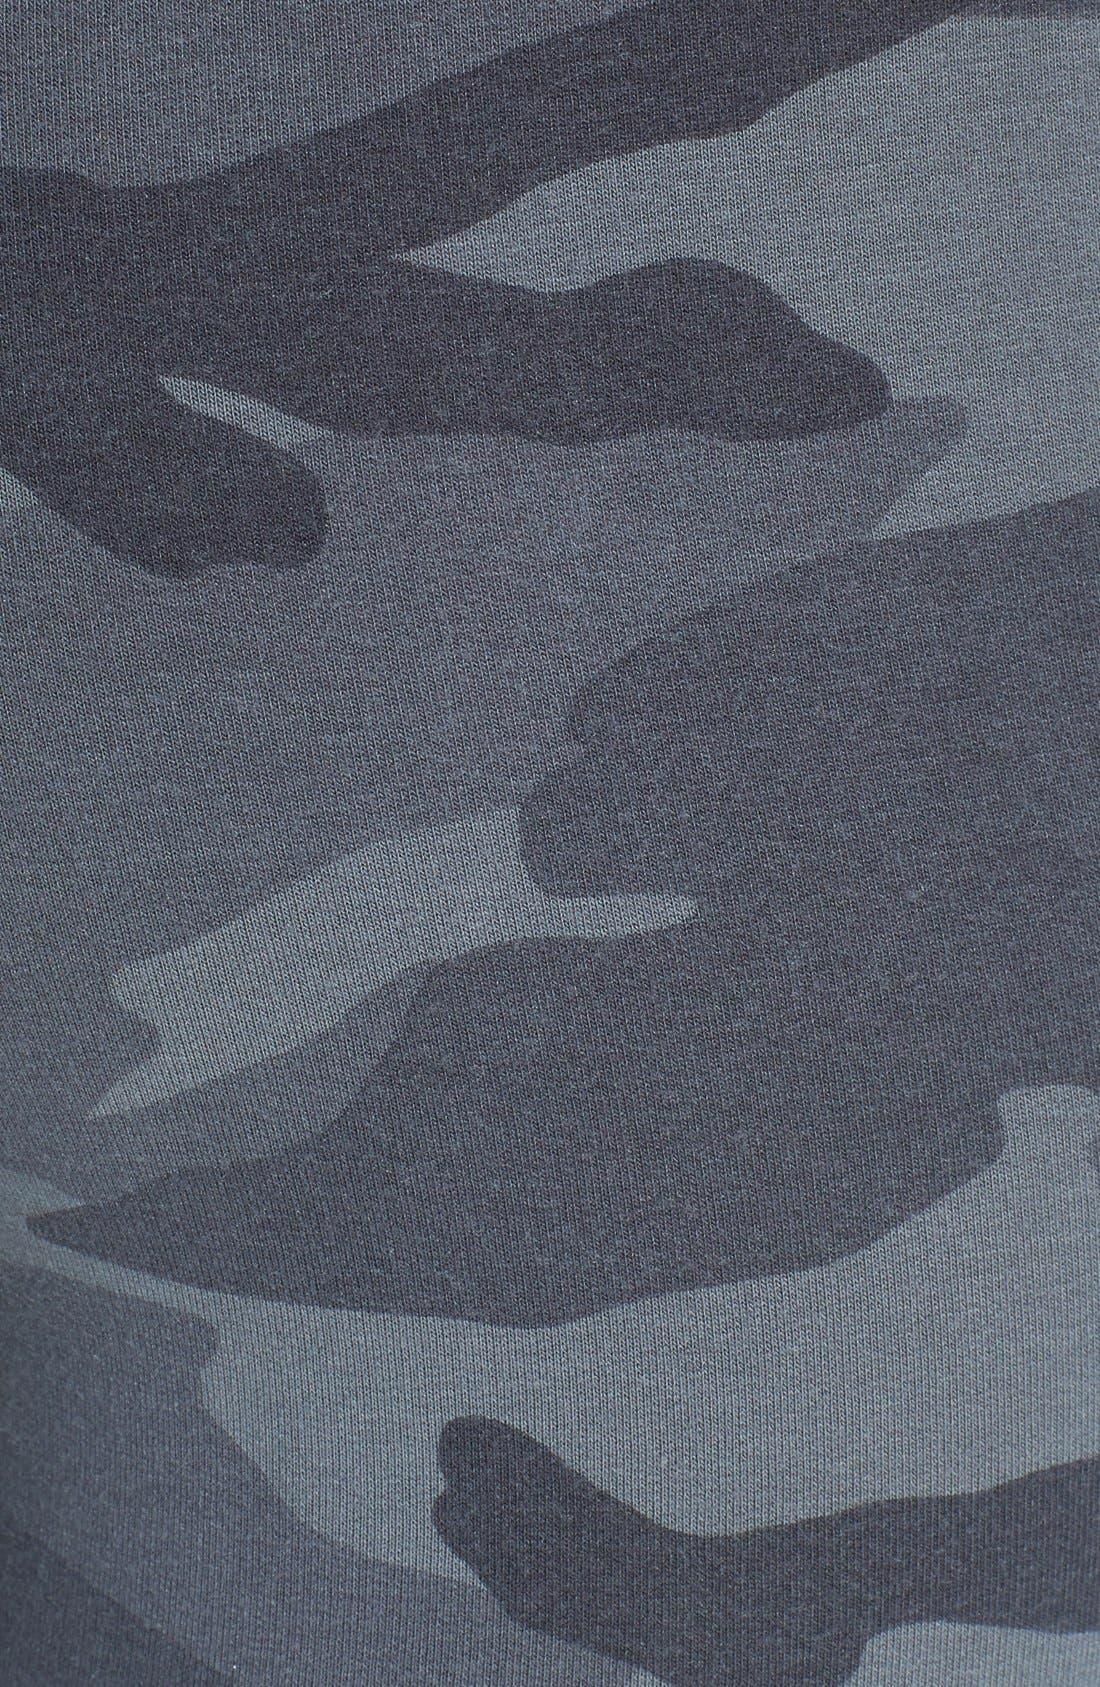 Alternate Image 3  - Splendid Camouflage Print Leggings